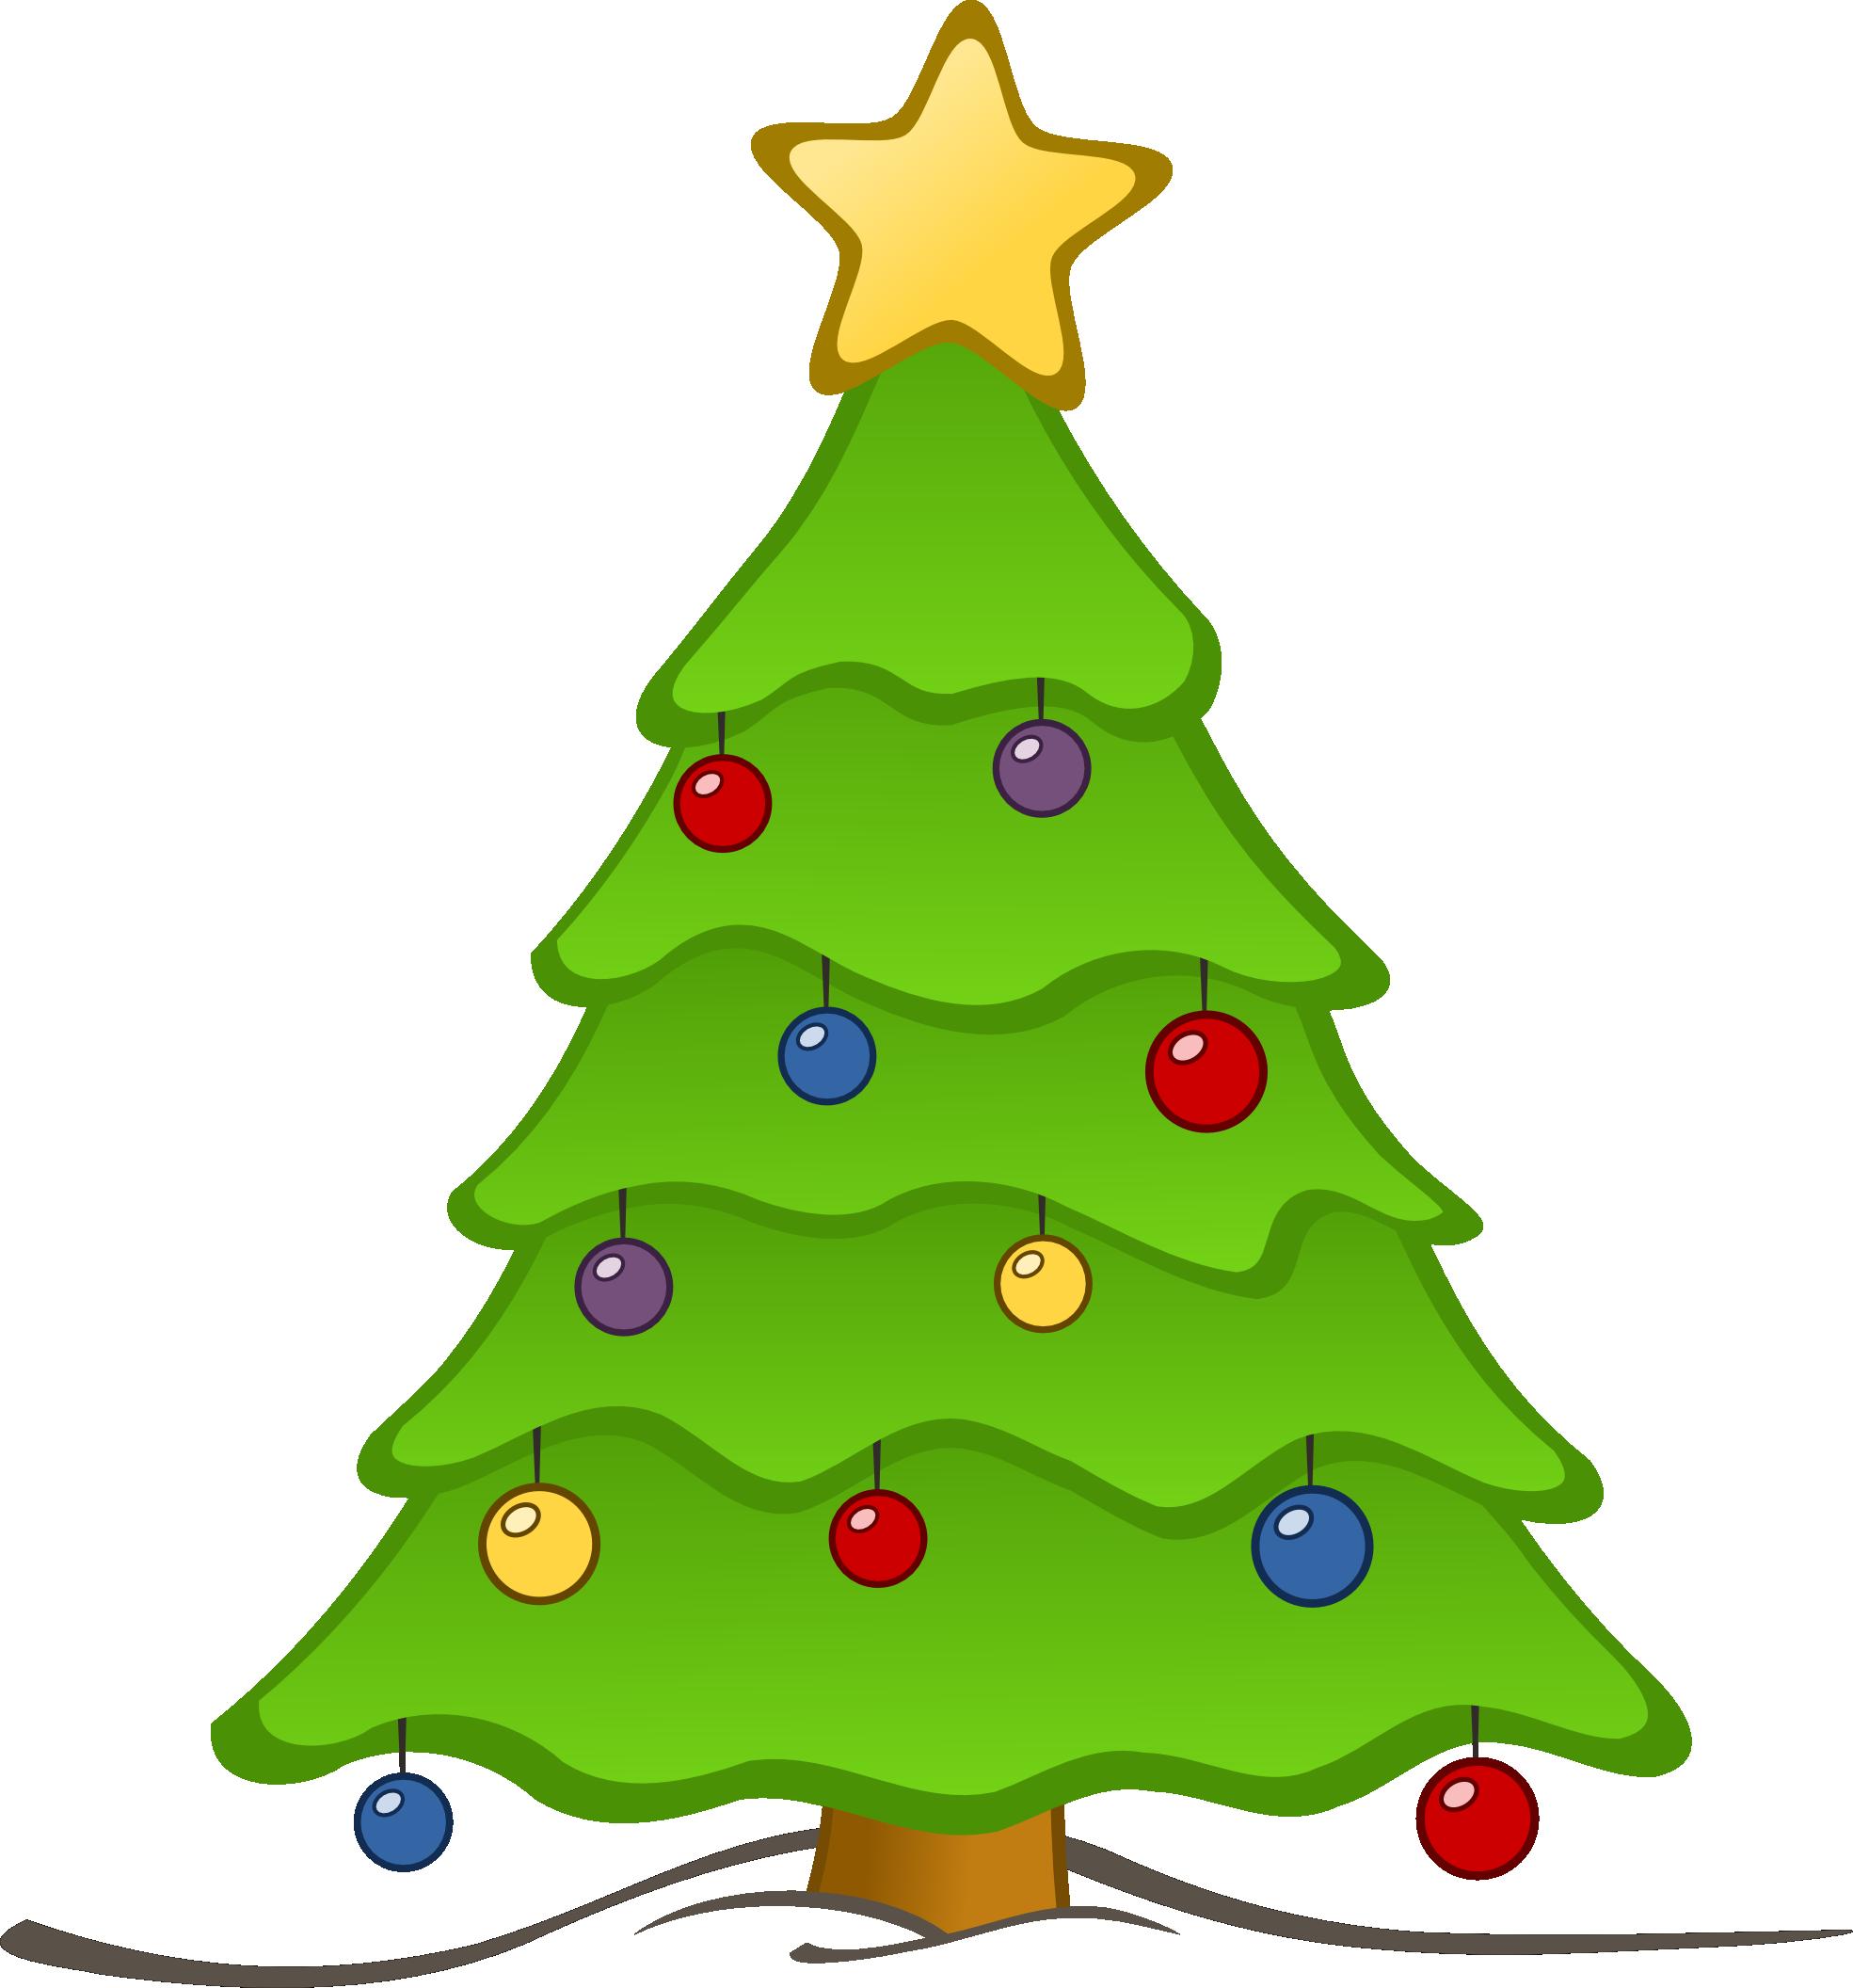 Costume clipart christmas tree. Arsenal pinterest clip art